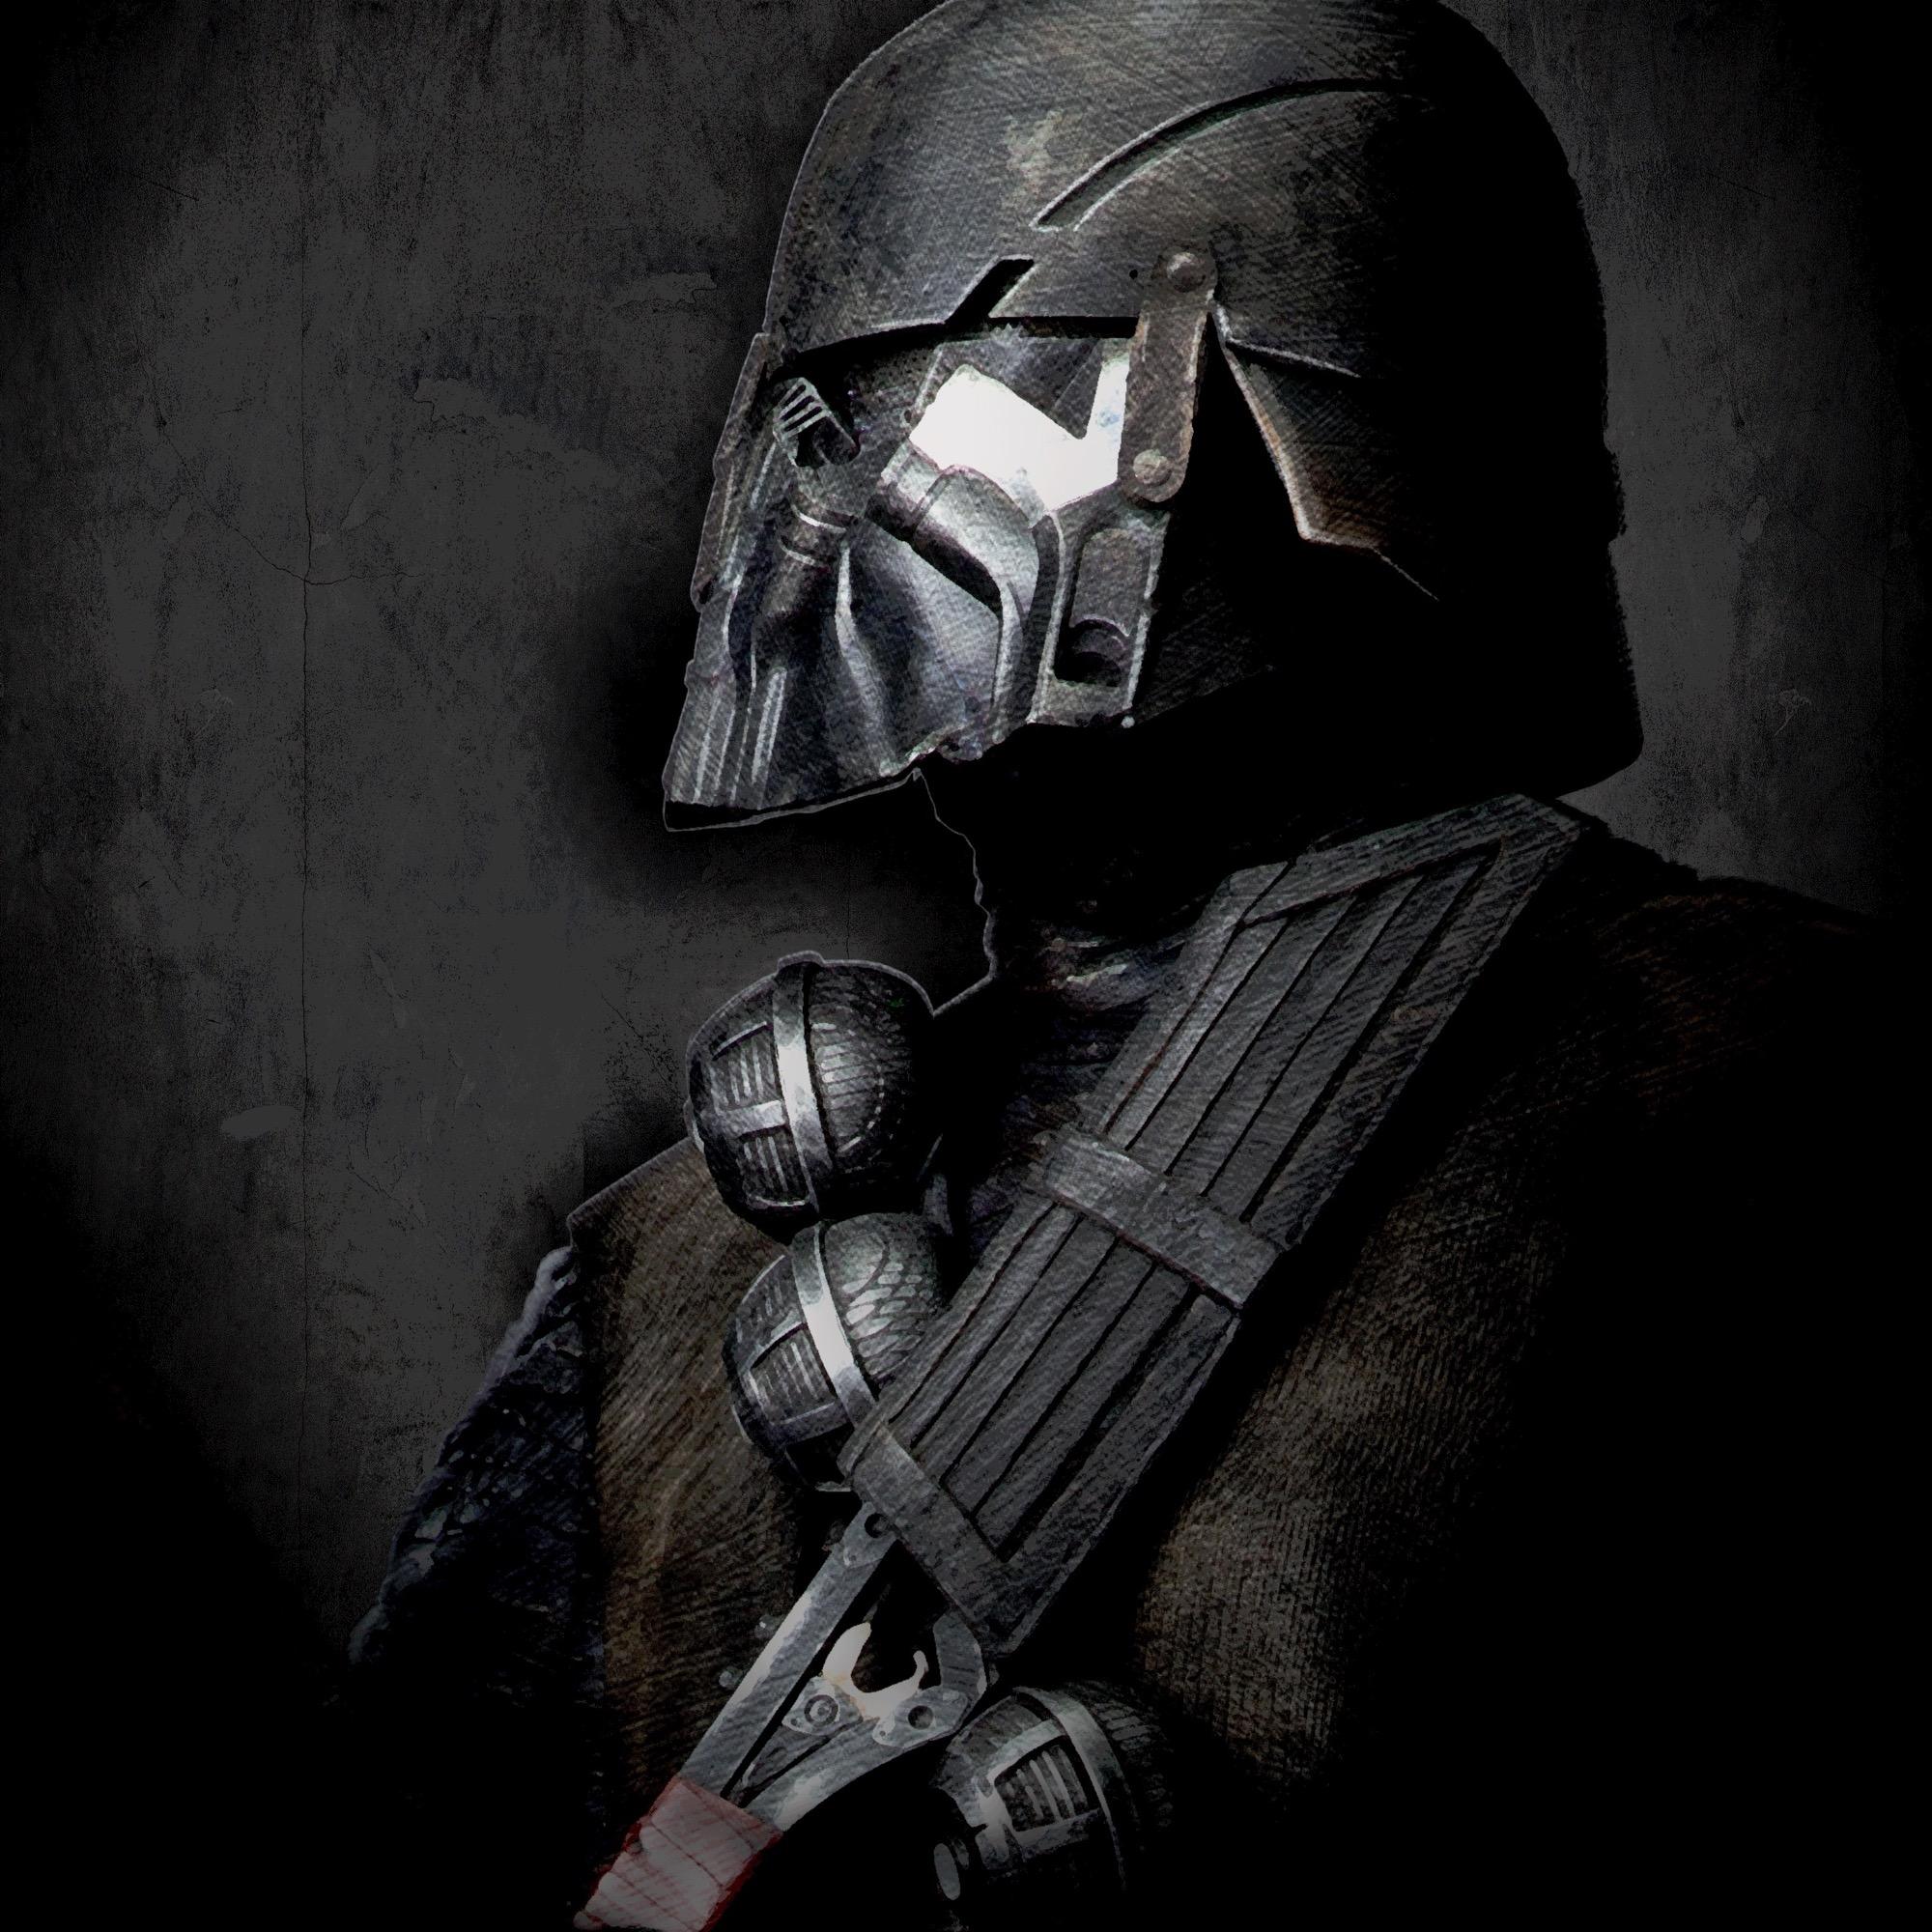 Fond écran Star Wars noir